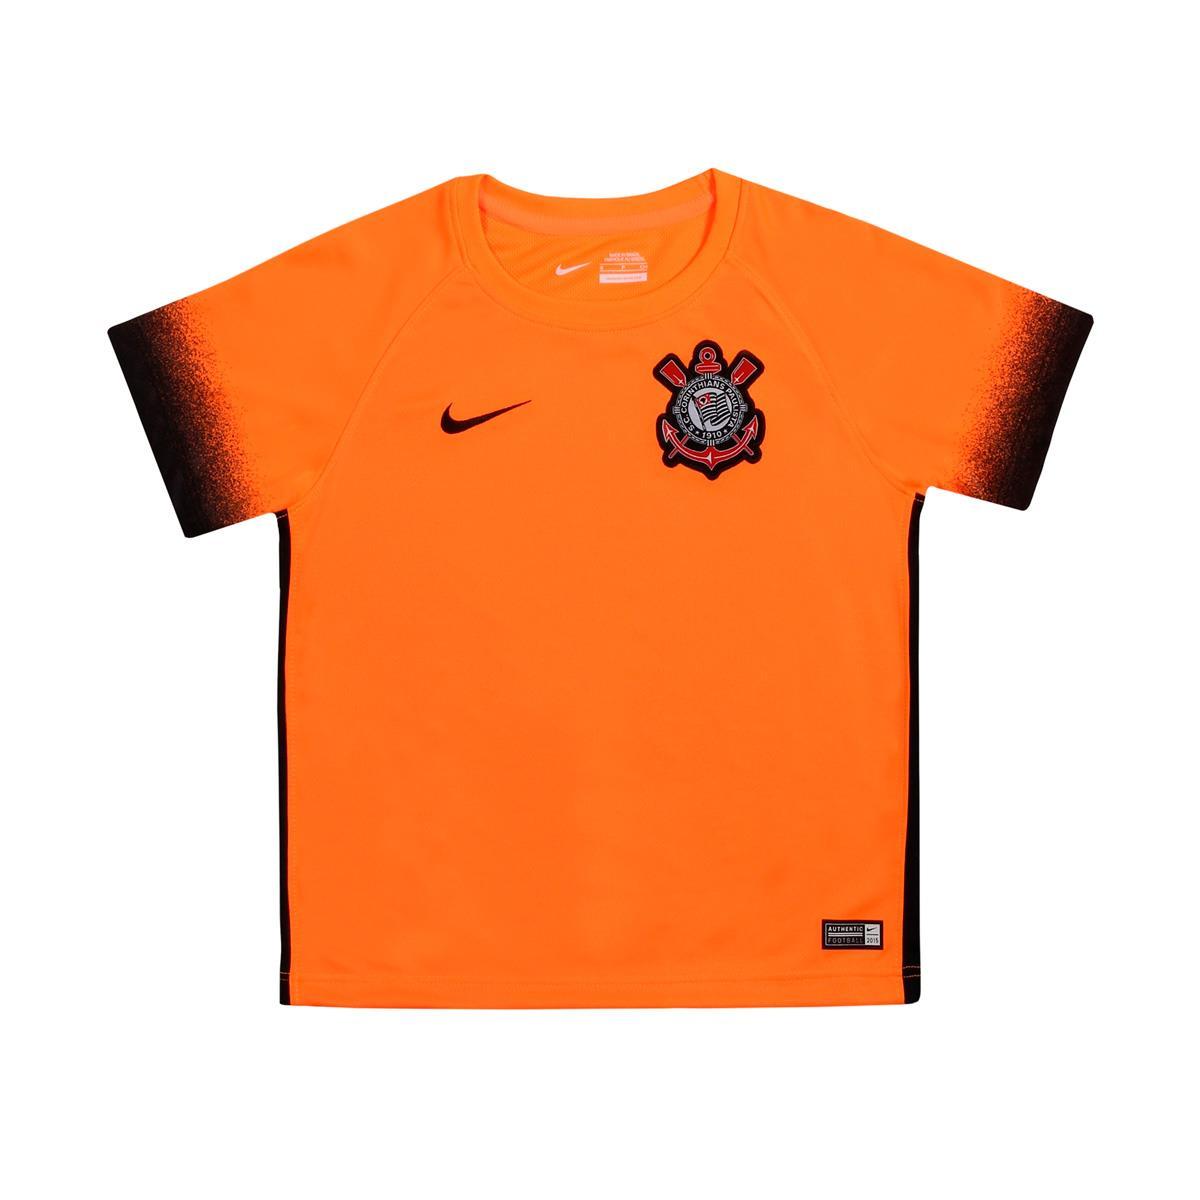 4f8ee98c9861b Camisa Nike Corinthians III 2015 2016 Torcedor Infantil